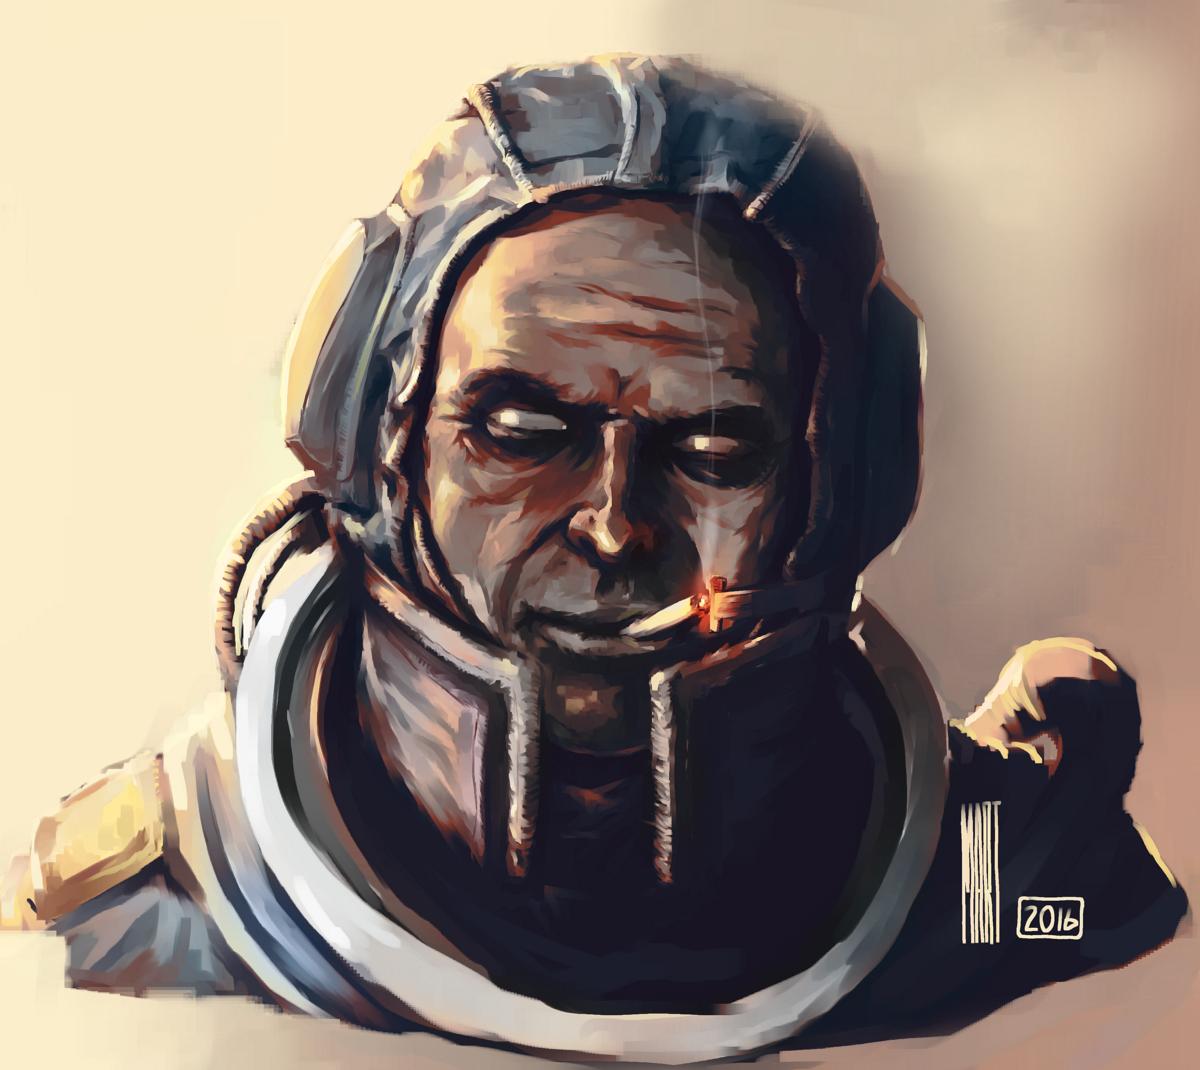 Thank you - Astronaut Speedpaint